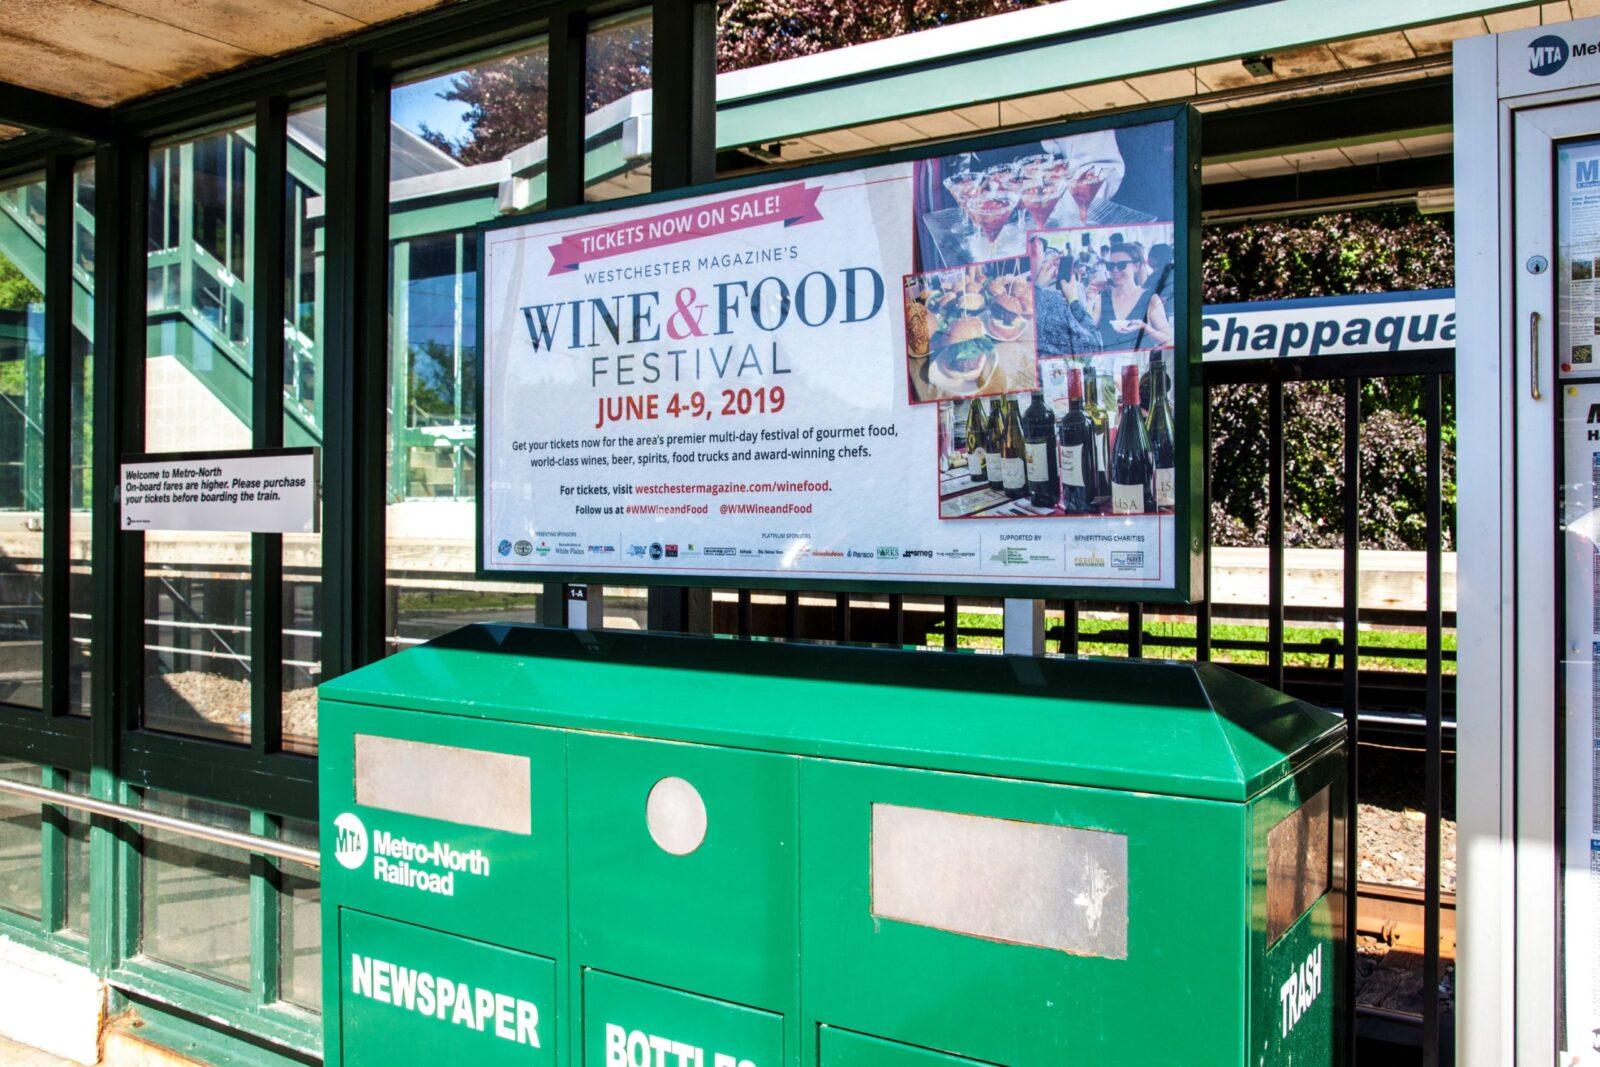 Westchester Wine & Food Festival Rail Platform Advertising